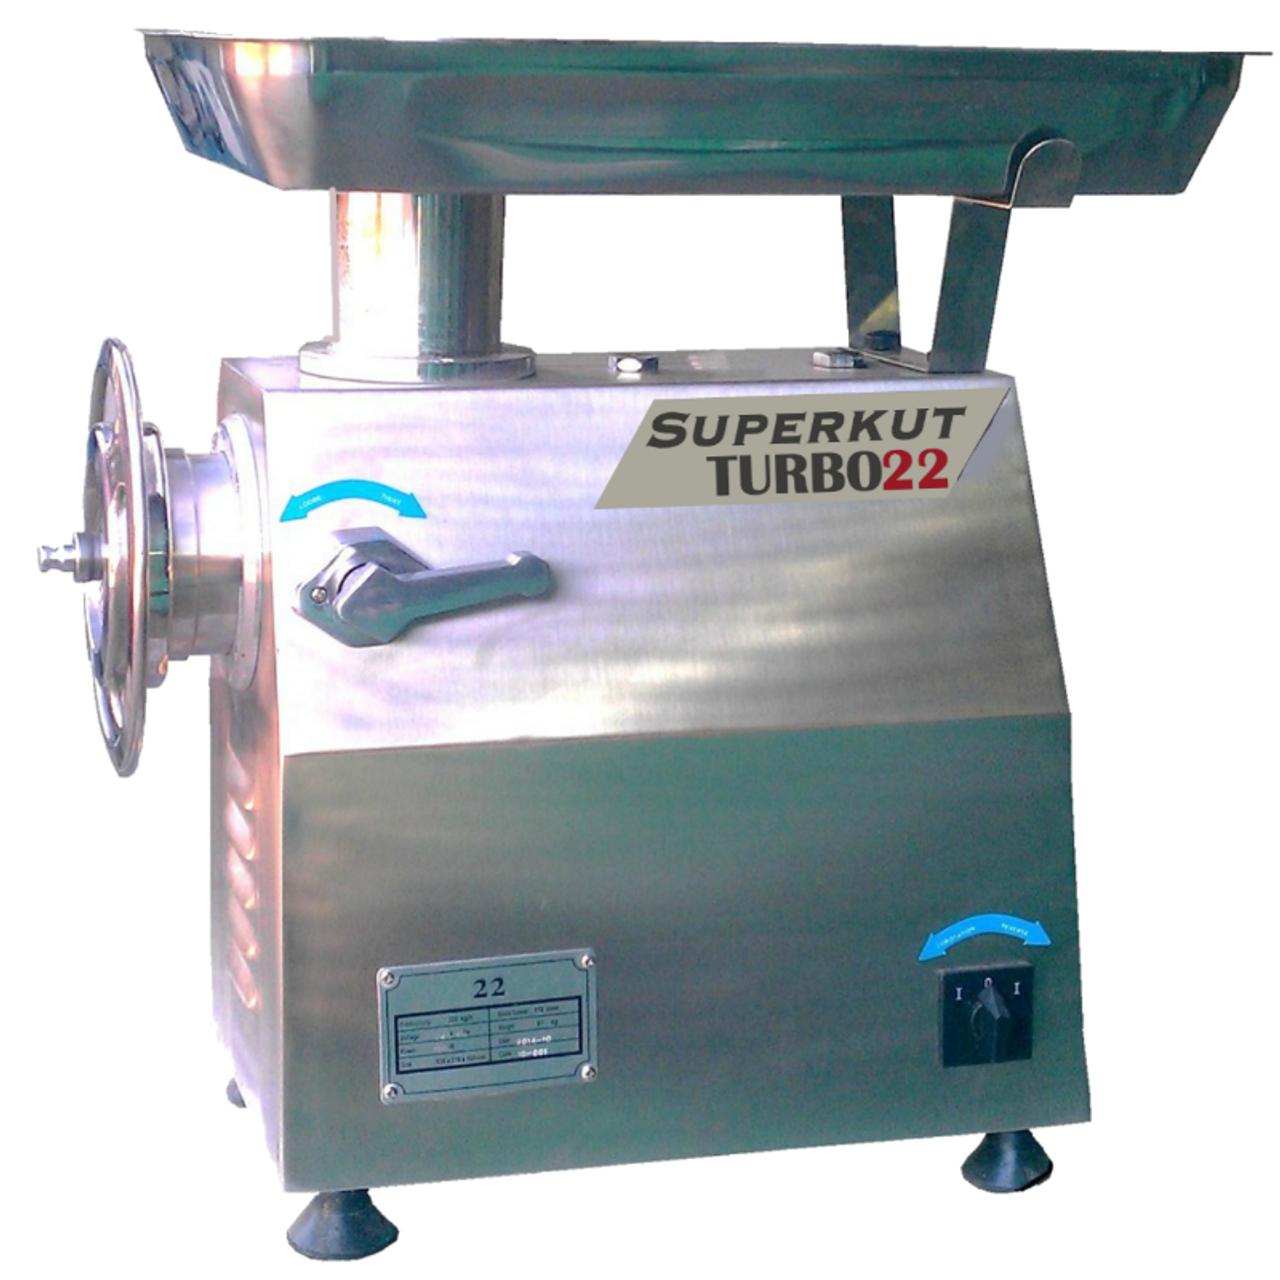 Superkut TURBO 22 Meat Mincer